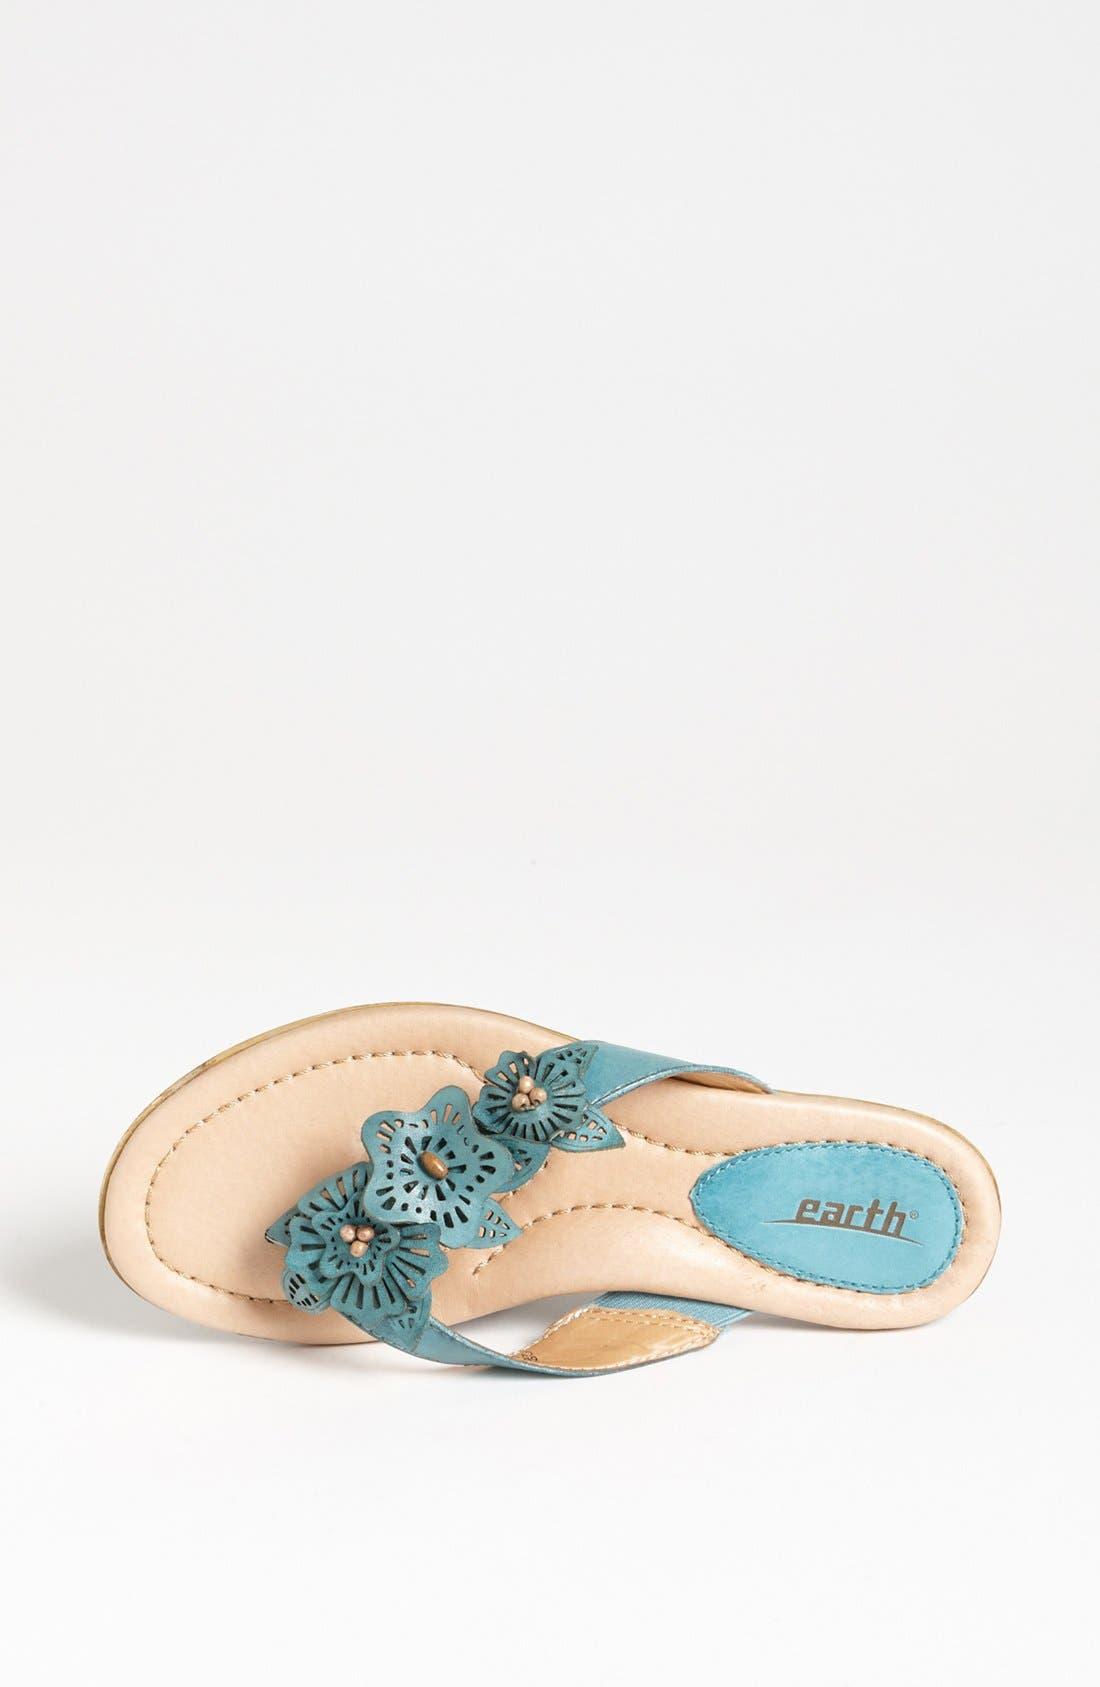 Alternate Image 3  - Earth® 'Breeze' Sandal